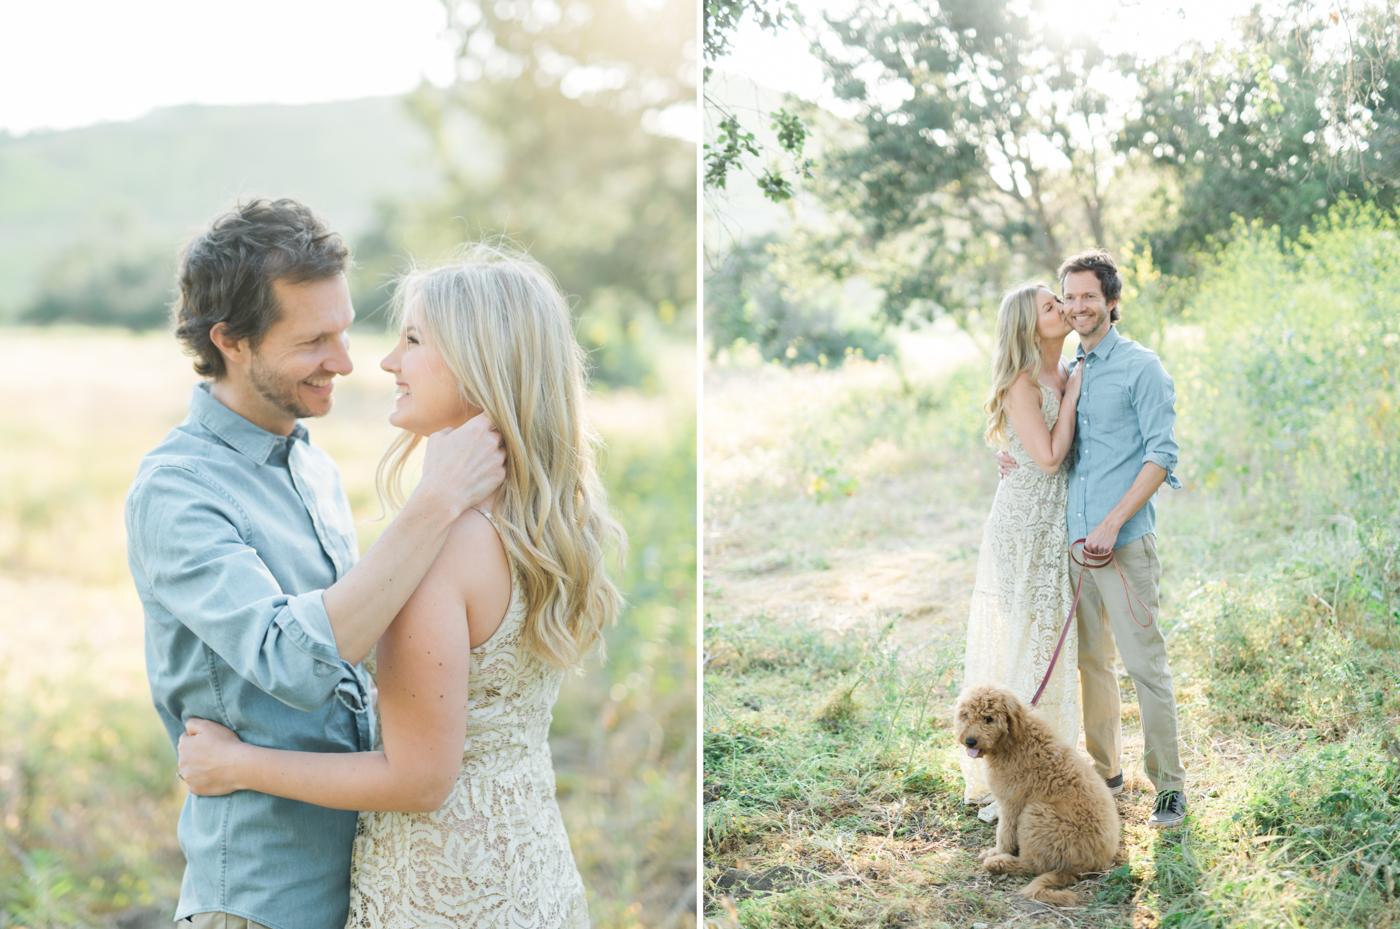 San_Juan_Capistrano_Goldendoodle_family_portrait_session_los_angeles_wedding_photographer-4.jpg